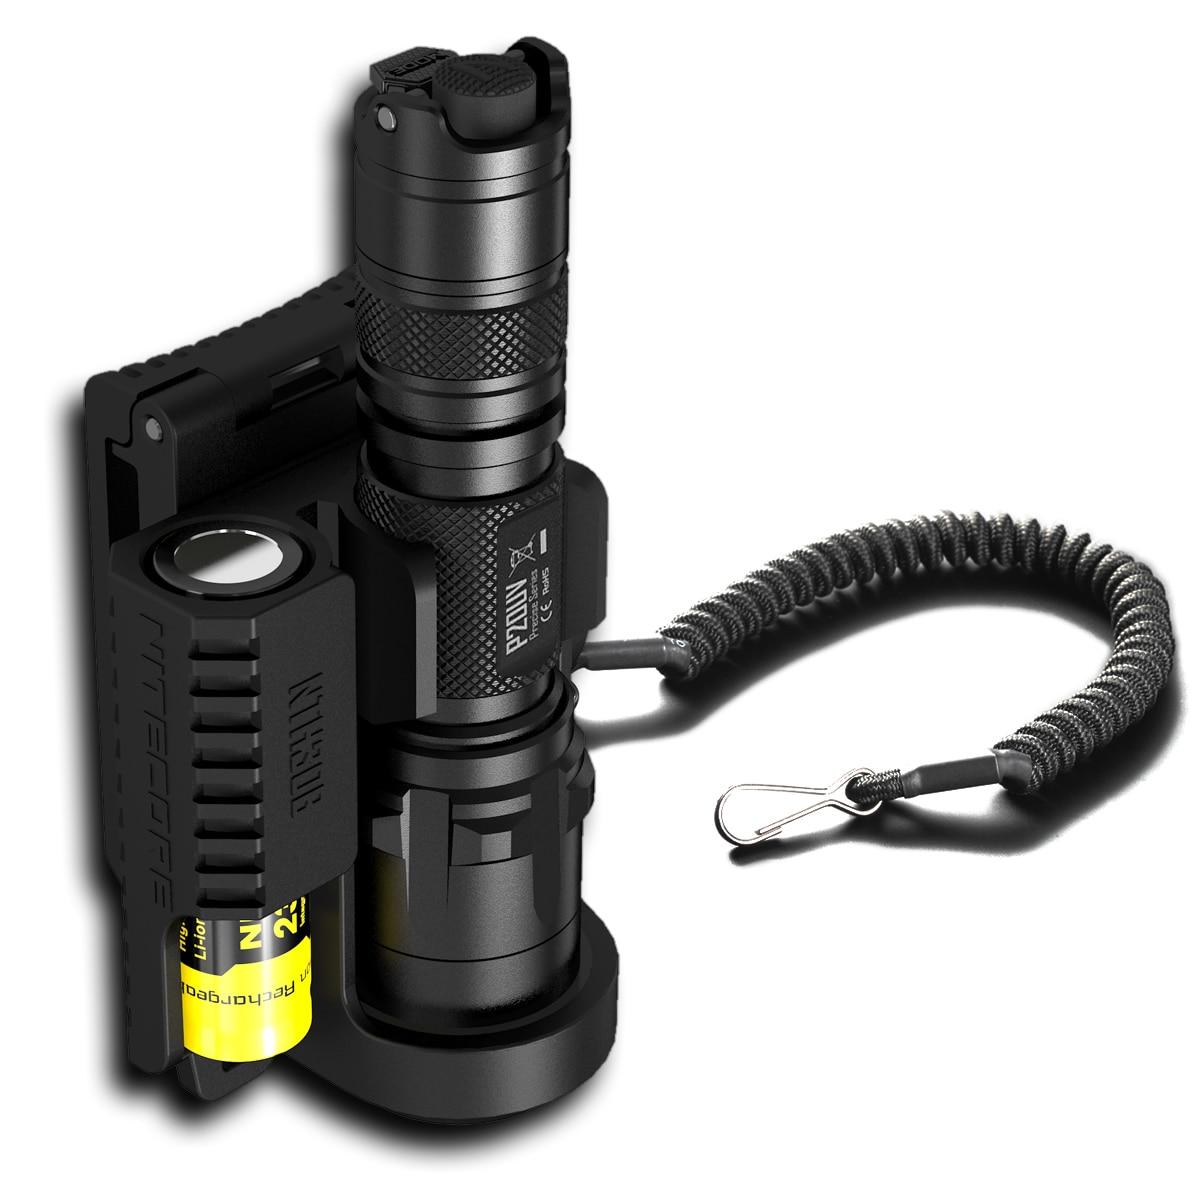 Discount NITECORE P20 P20UV Tactical LED Flashlight Waterproof Outdoor Camp Hunt Portable NTL10 NTH30B 2300mah Battery